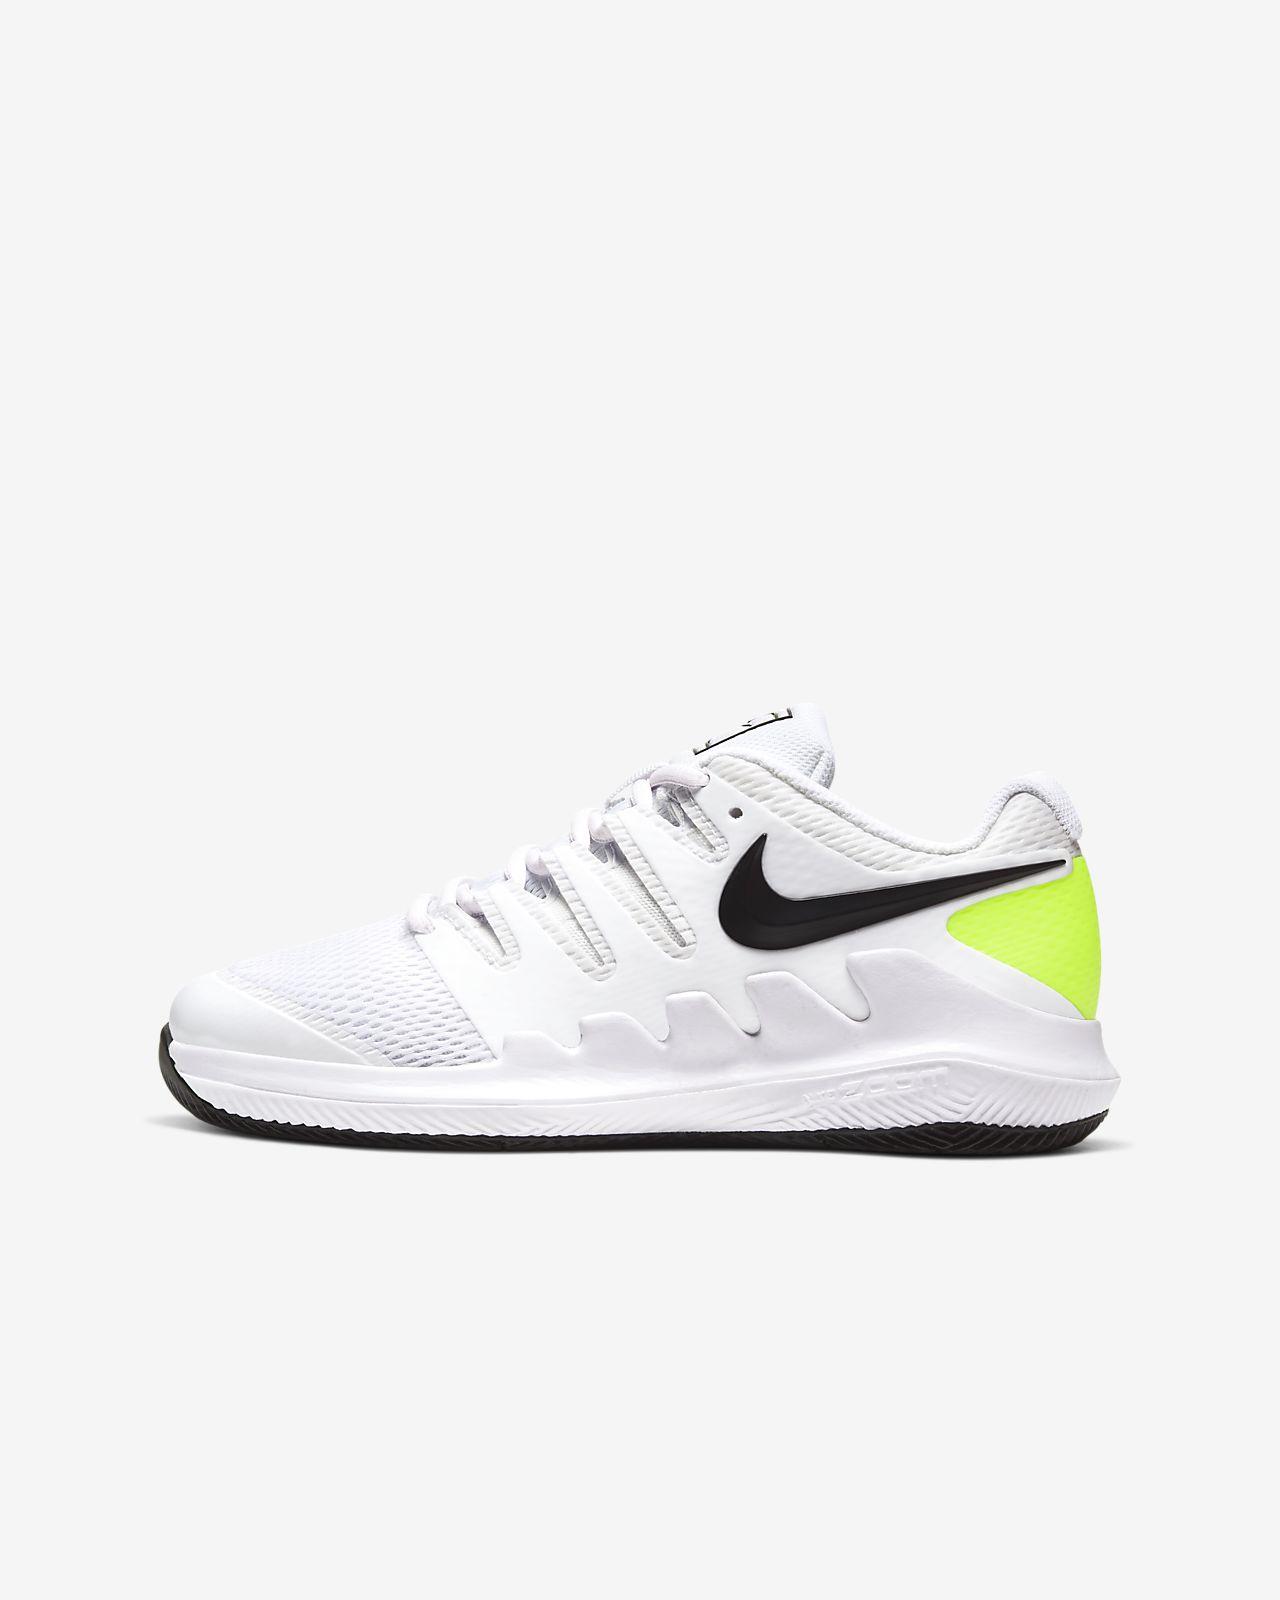 NikeCourt Jr. Vapor X Younger/Older Kids' Tennis Shoe